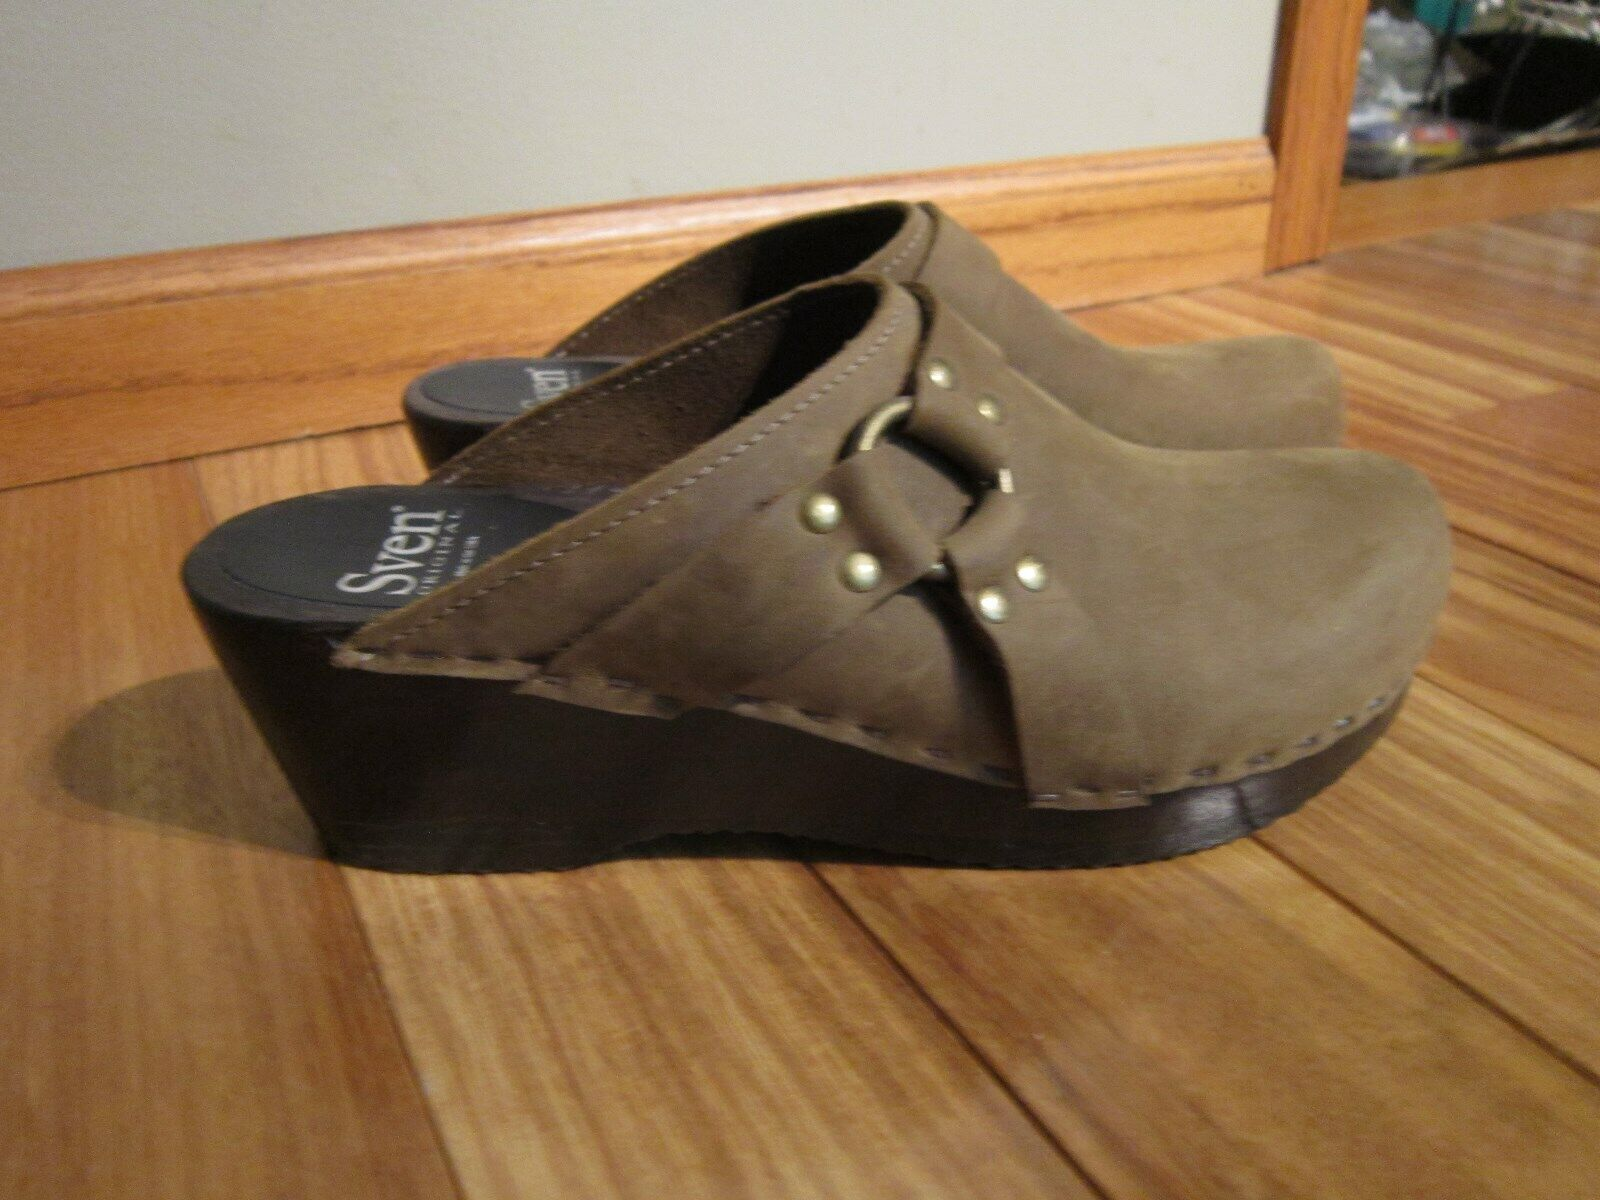 Sven Swedish Clogs Slip On Shoes Leather Suede SZ 40 (US 8 ) #SHOE10